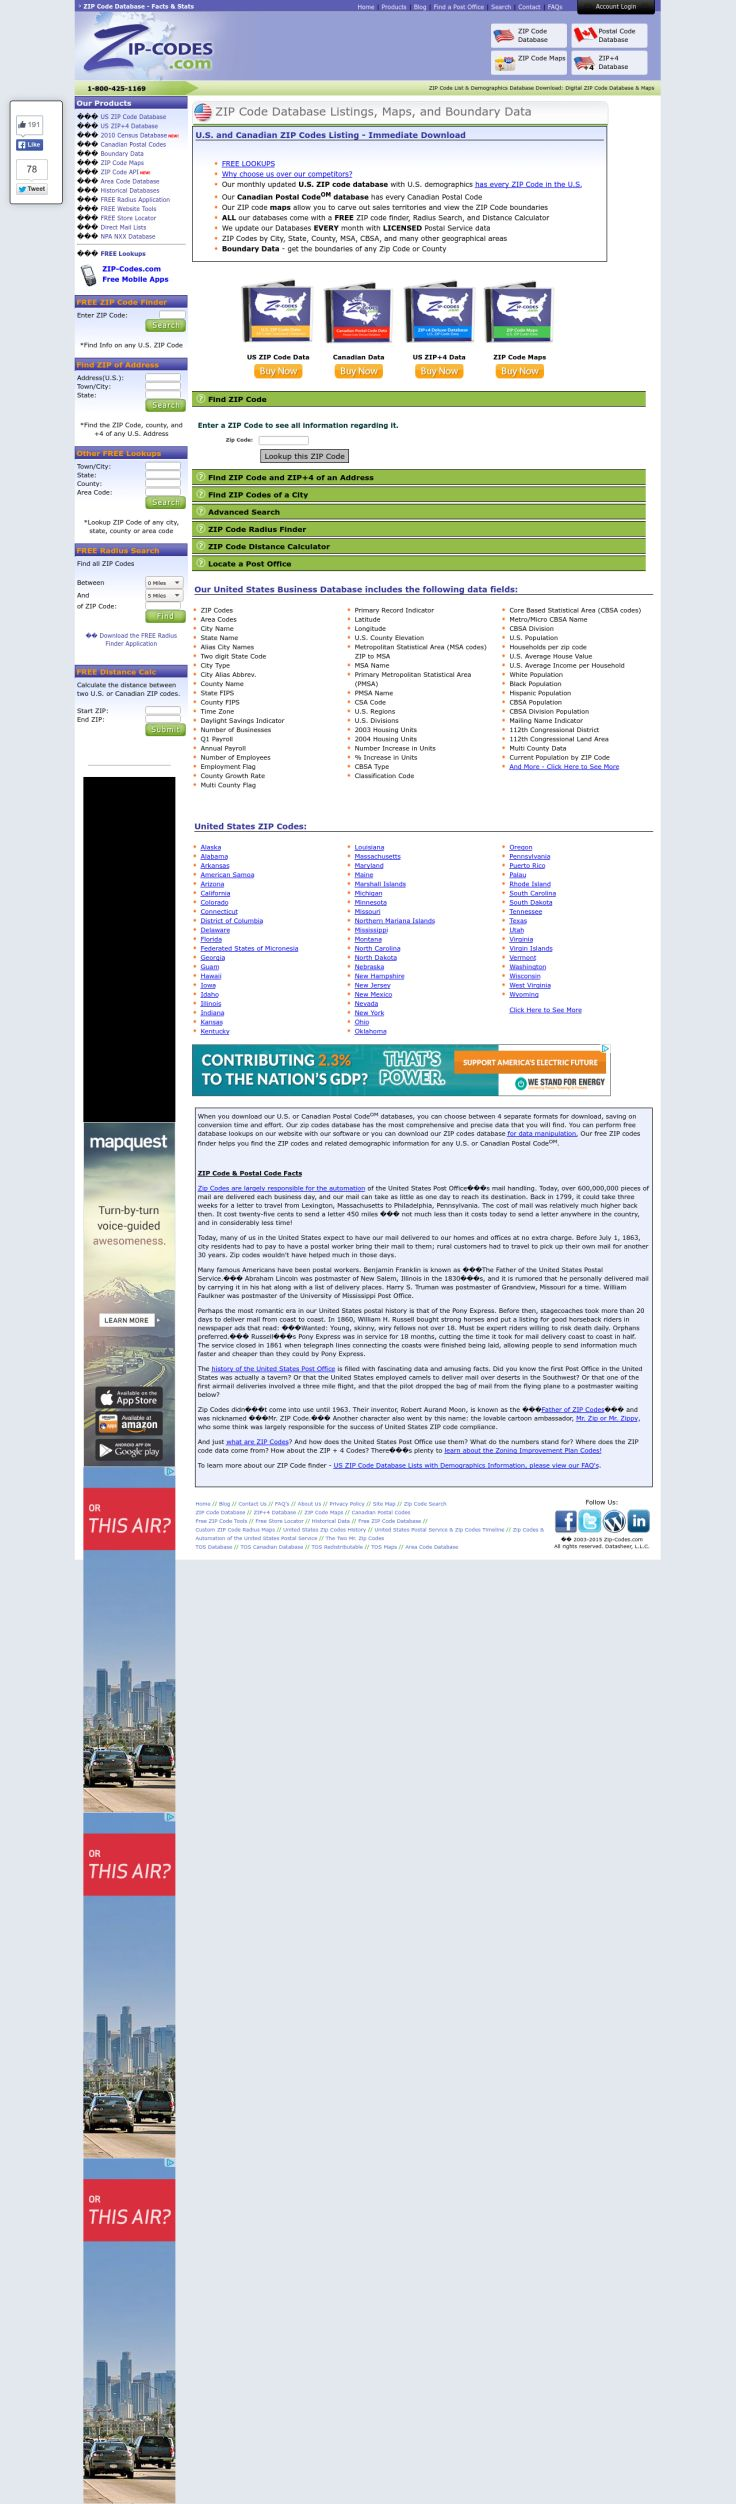 Best Zip Code Lookup Ideas On Pinterest Getting Rid Of - Canada postal code database free download